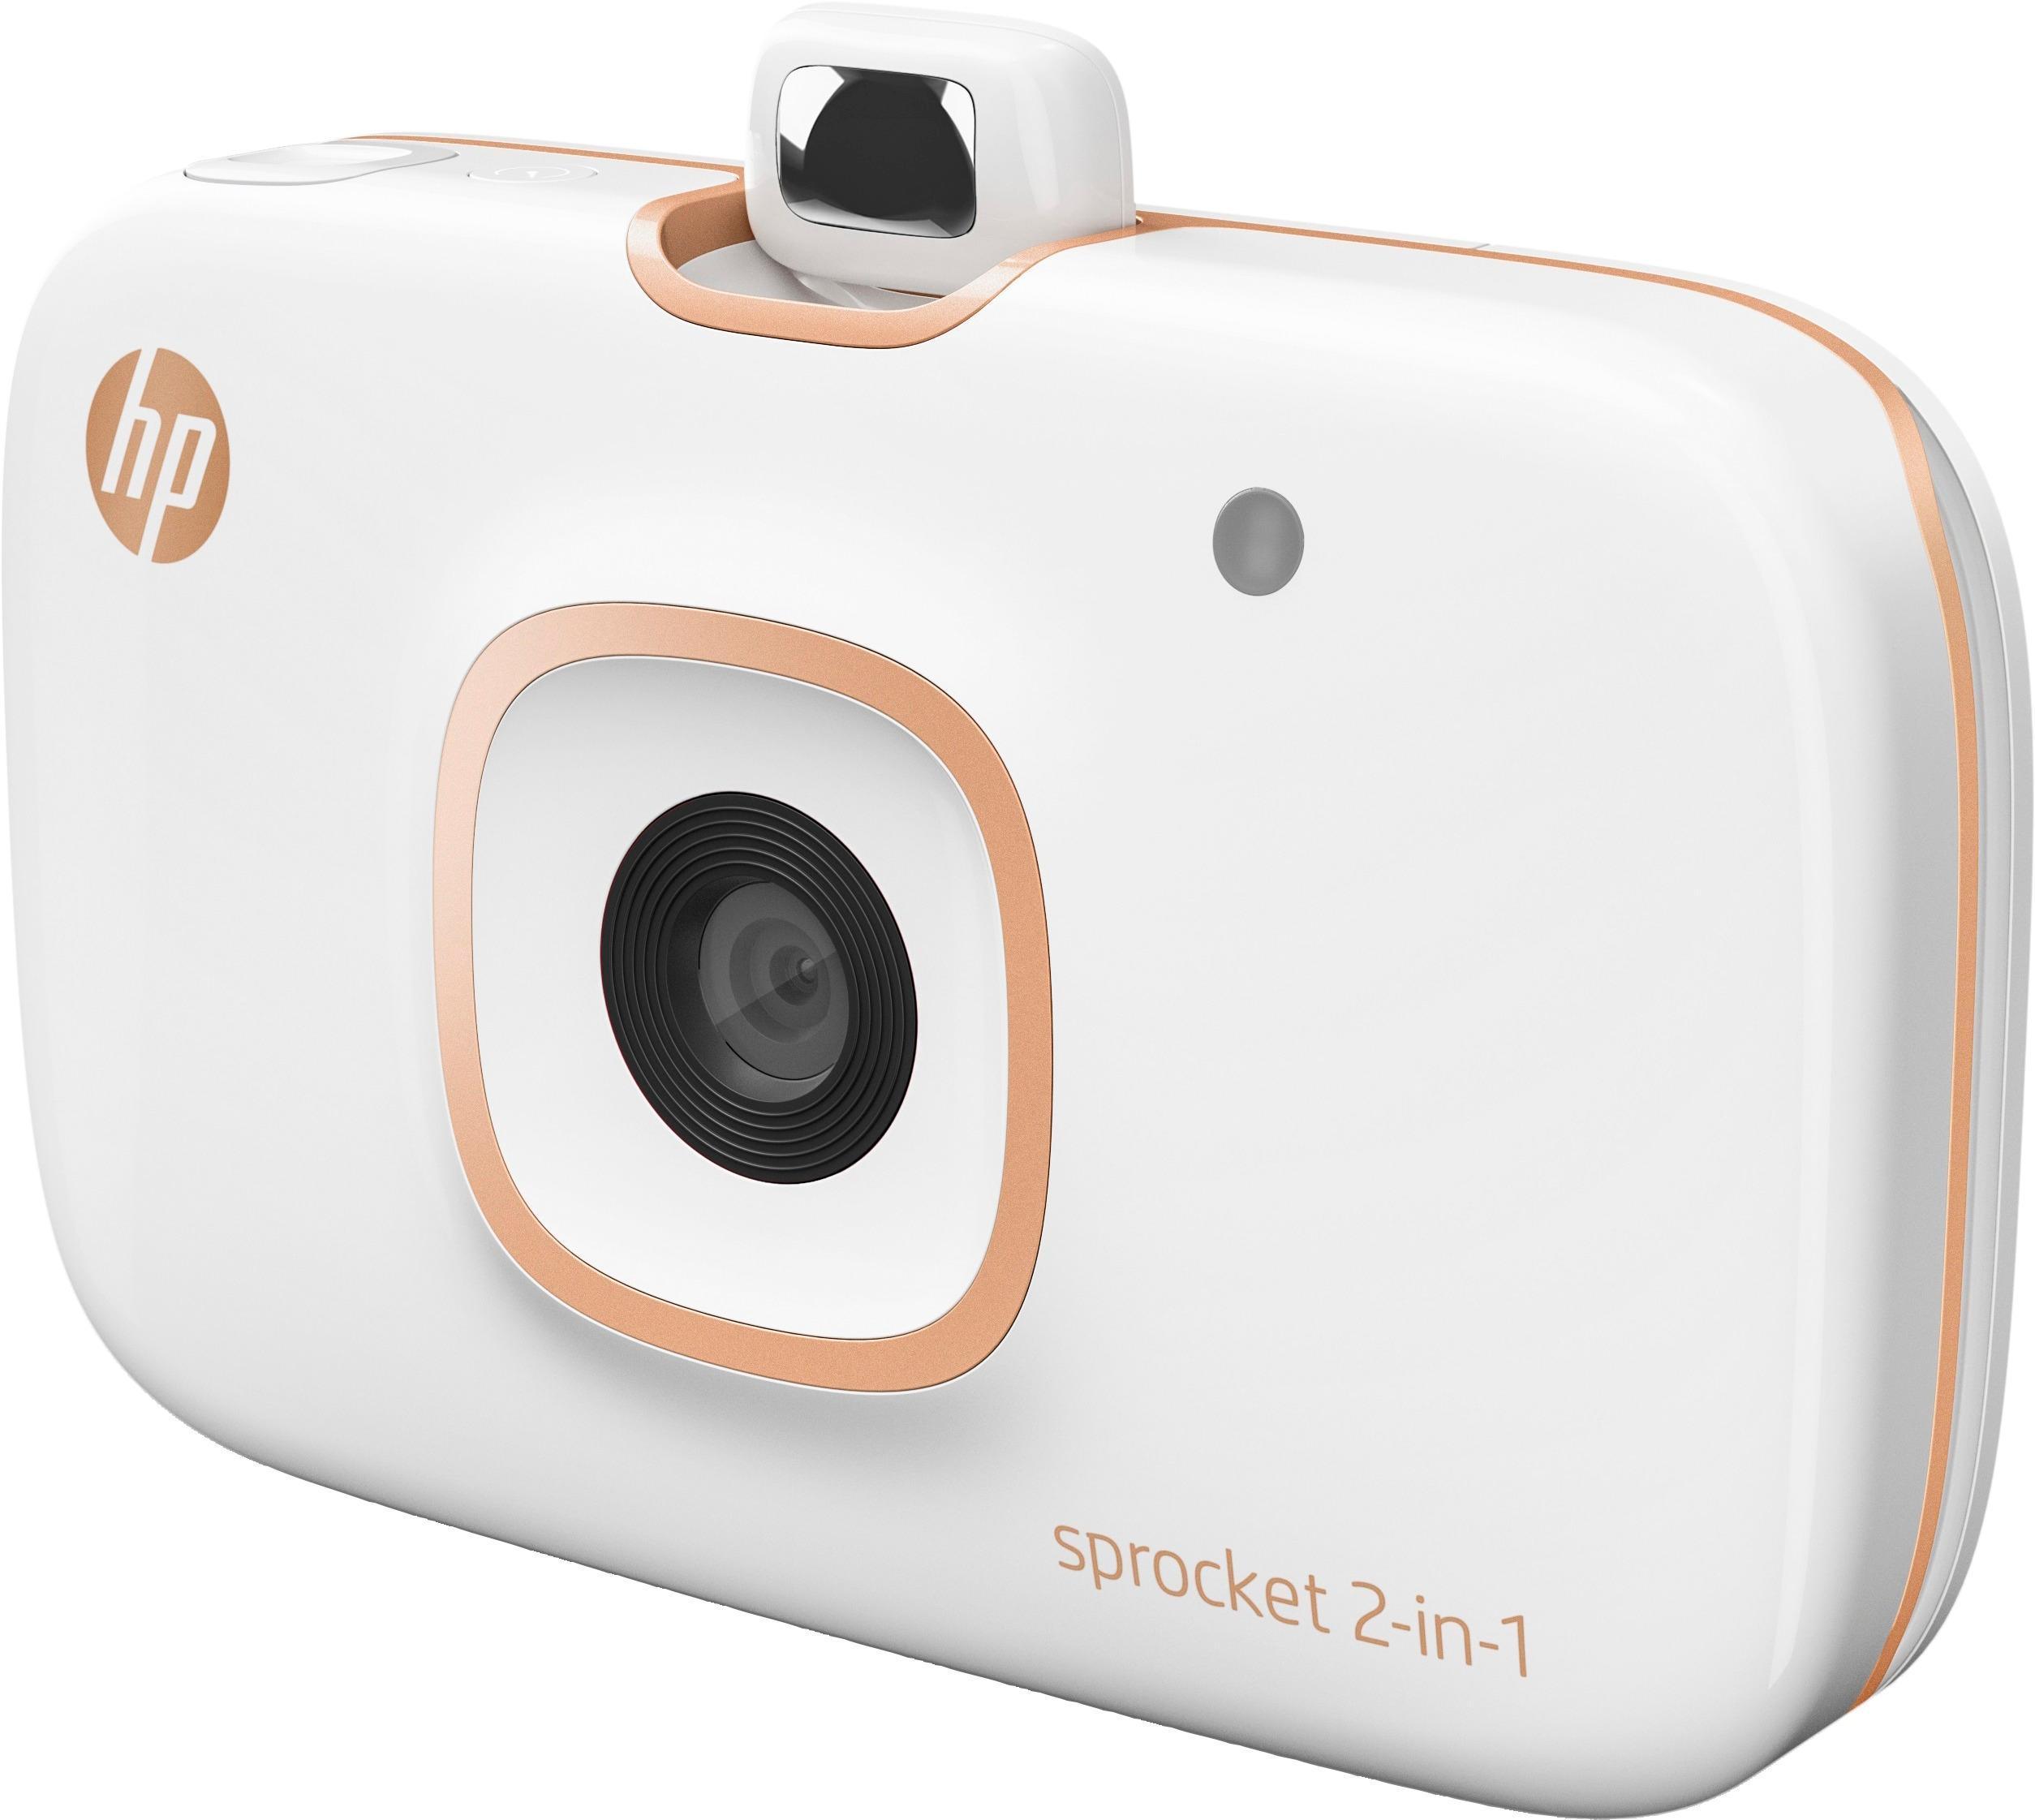 HP - Sprocket 2-in-1 Photo Printer $59.95